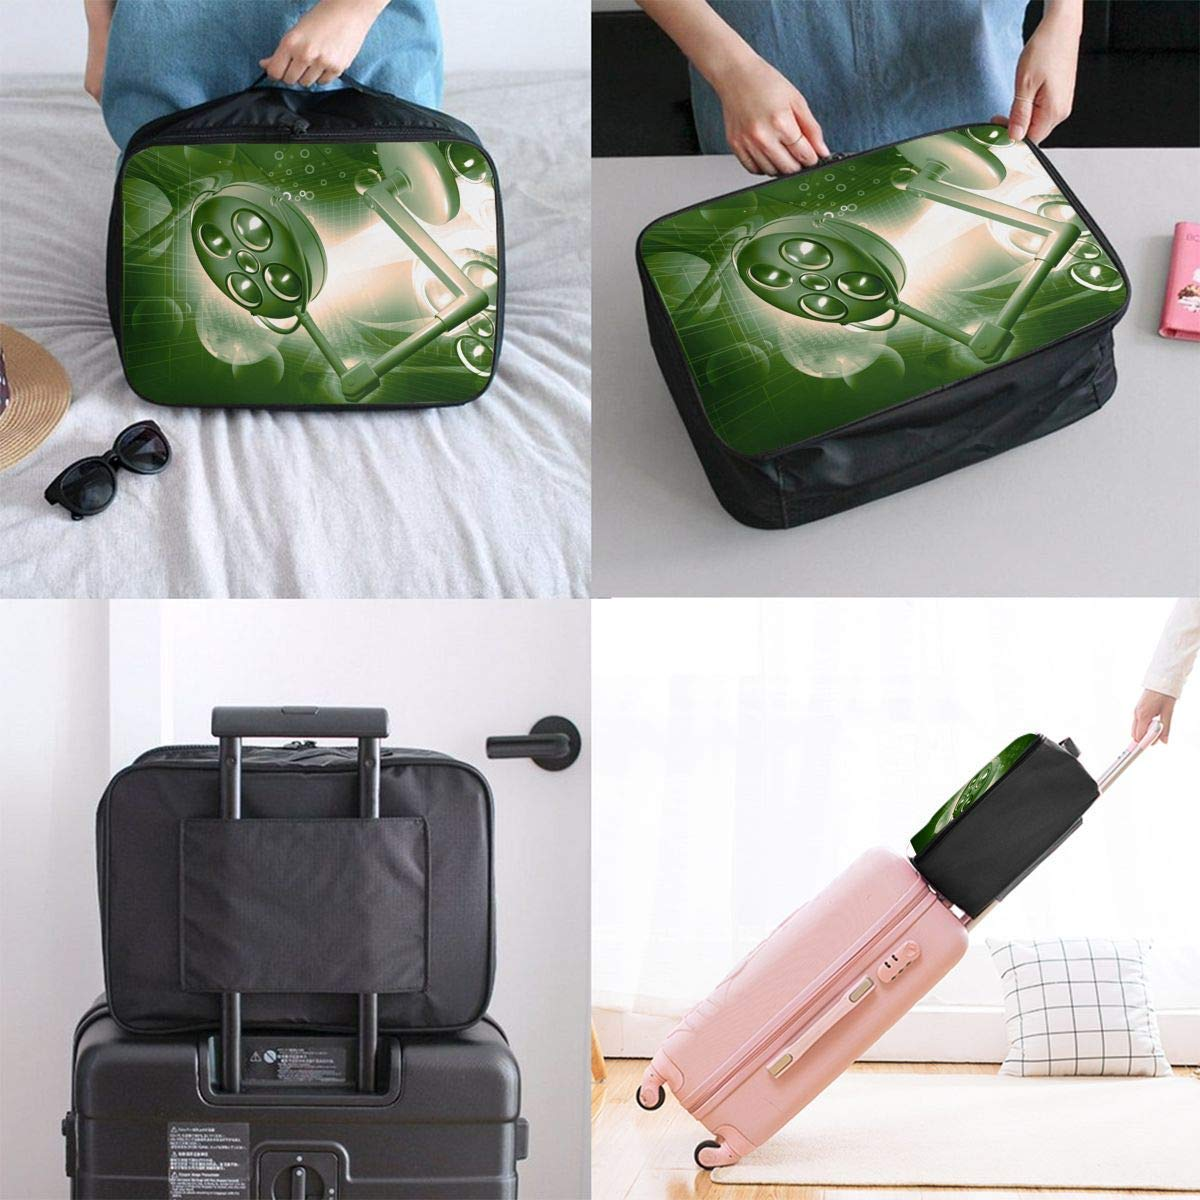 JTRVW Luggage Bags for Travel Lightweight Large Capacity Portable Duffel Bag for Men /& Women Summer Surfing Travel Duffel Bag Backpack